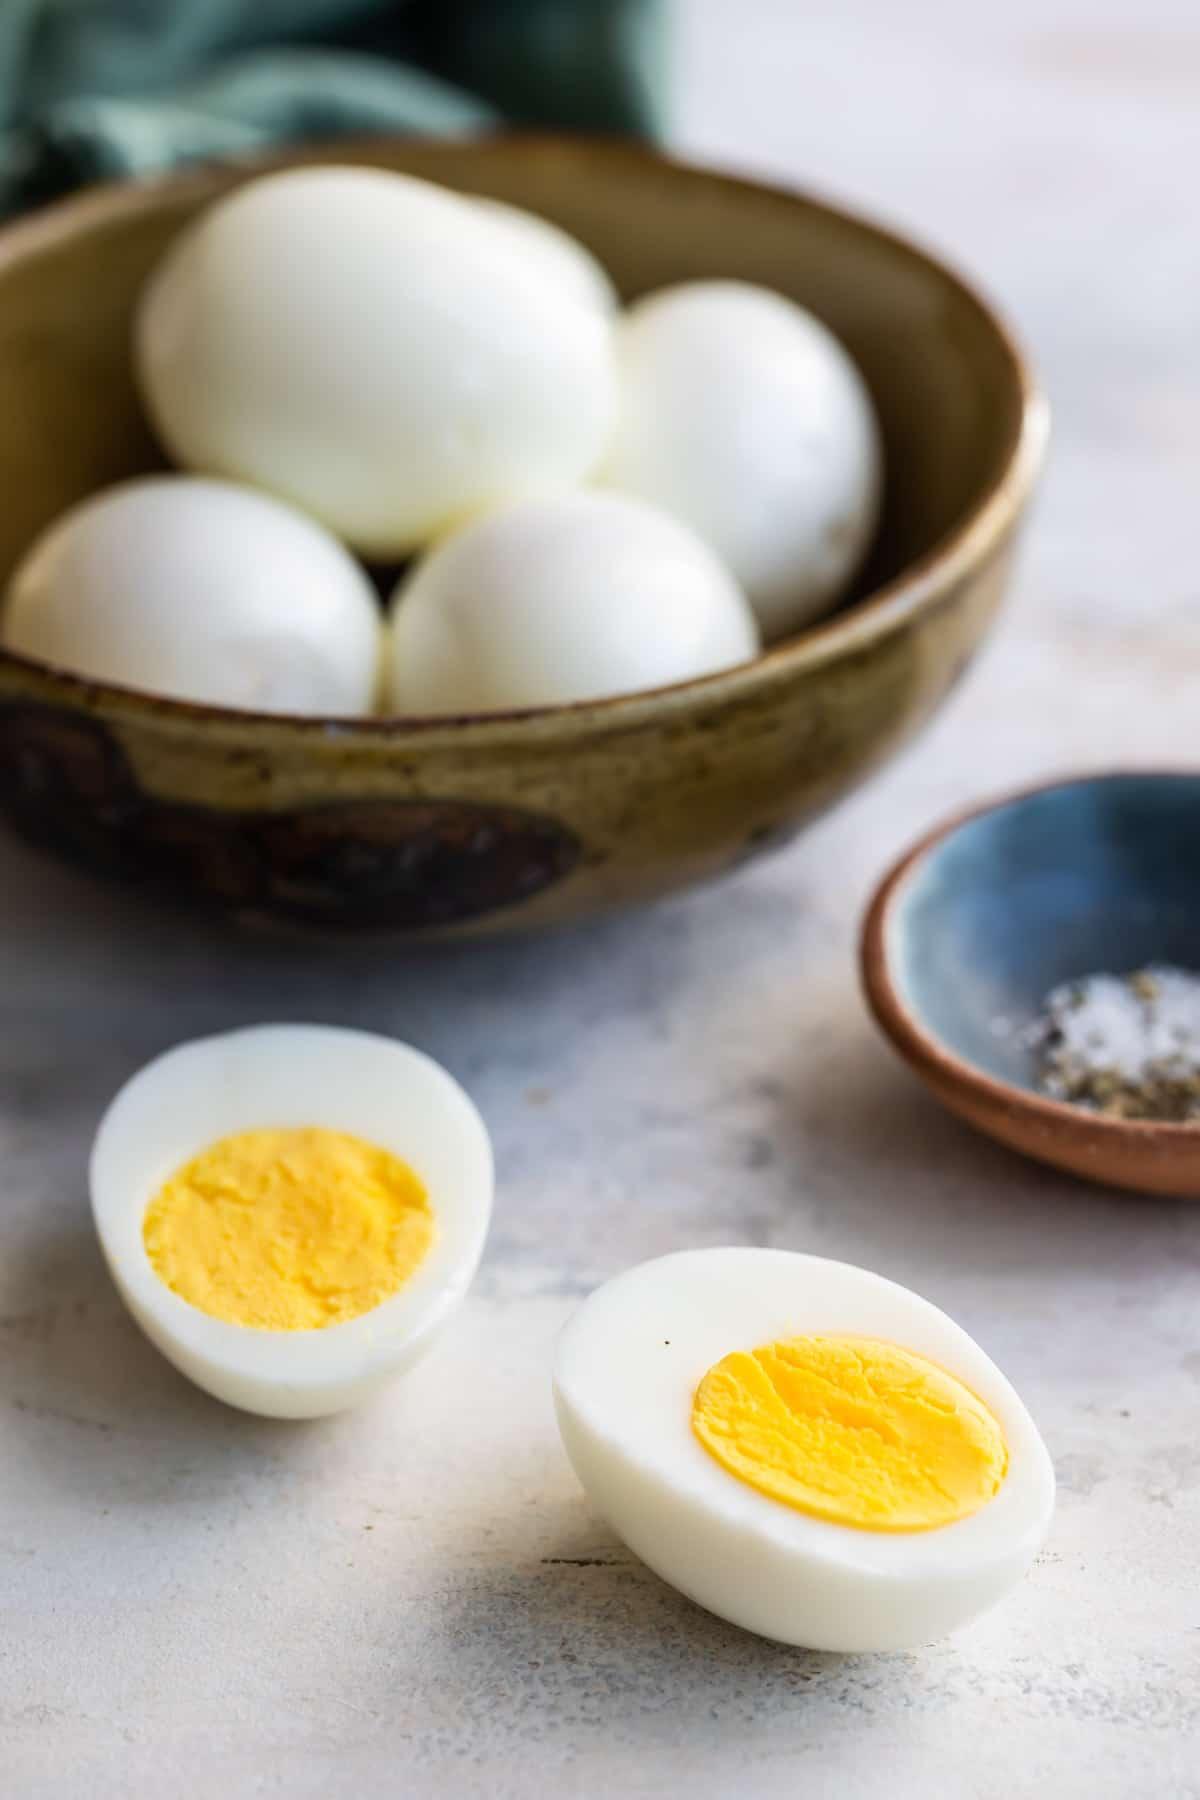 Hard-boiled eggs in a bowl, one split in half in front.